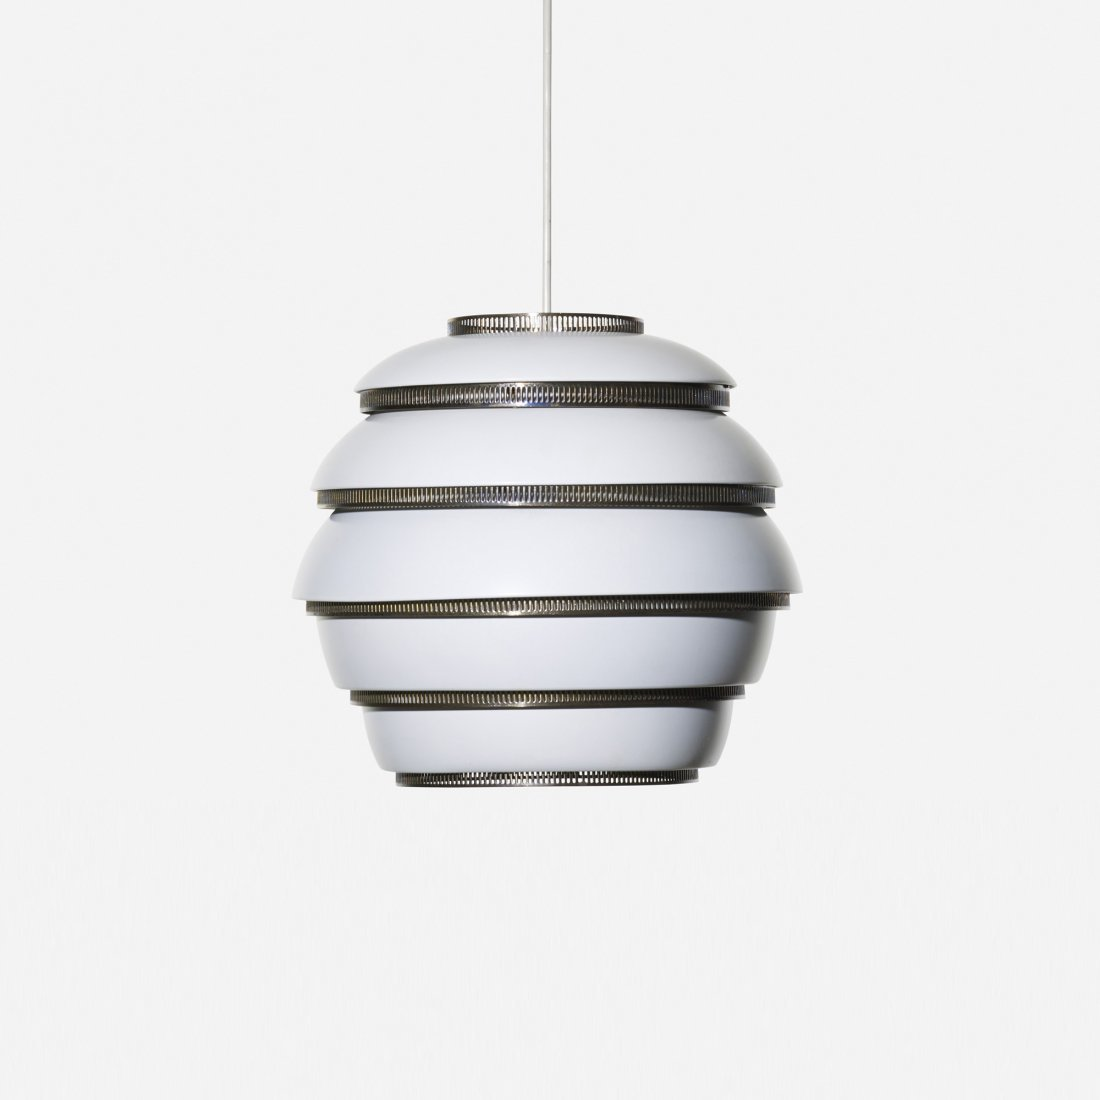 Alvar Aalto Beehive ceiling lamp, model A331